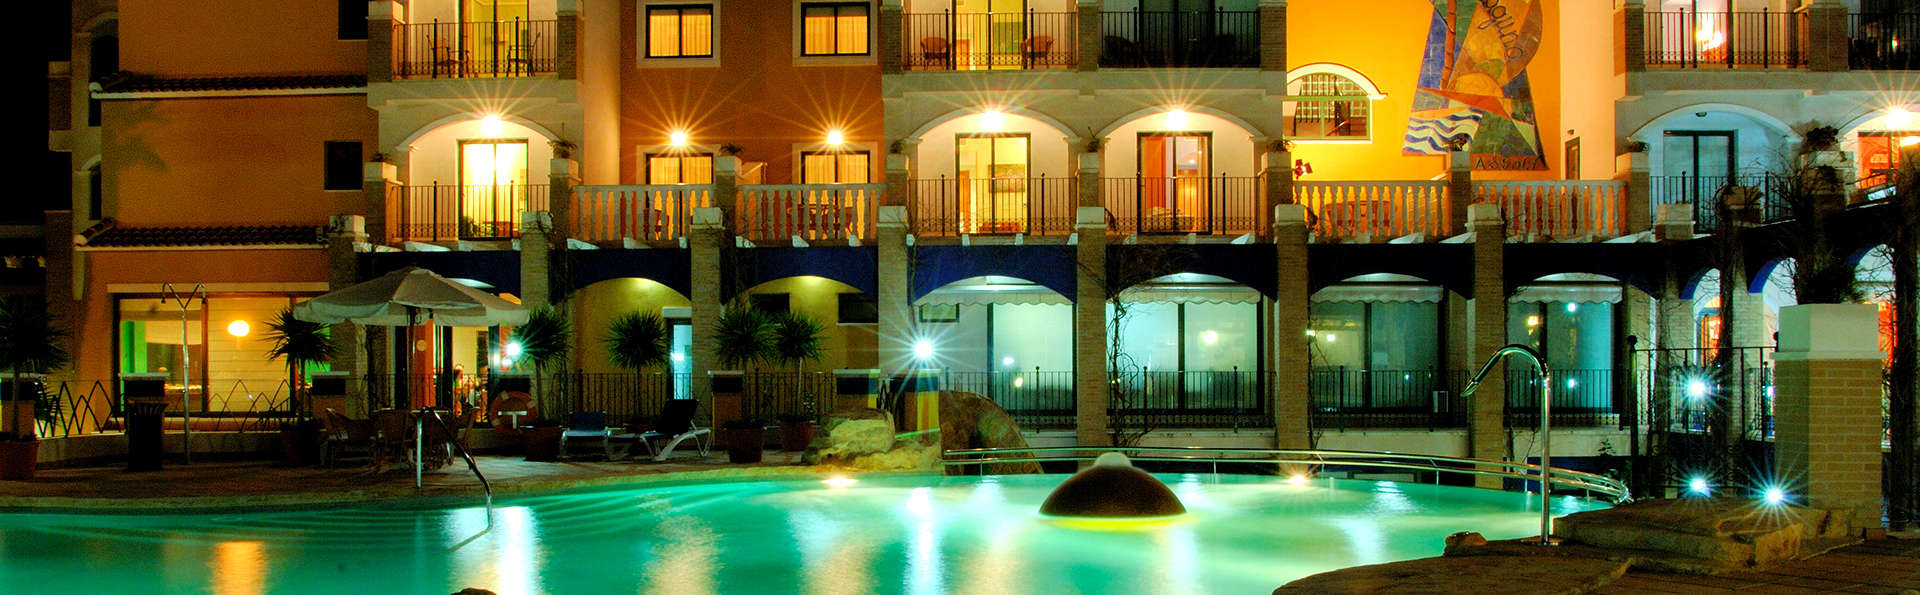 Hotel La Laguna Spa & Golf - EDIT_NEW_FRONT.jpg